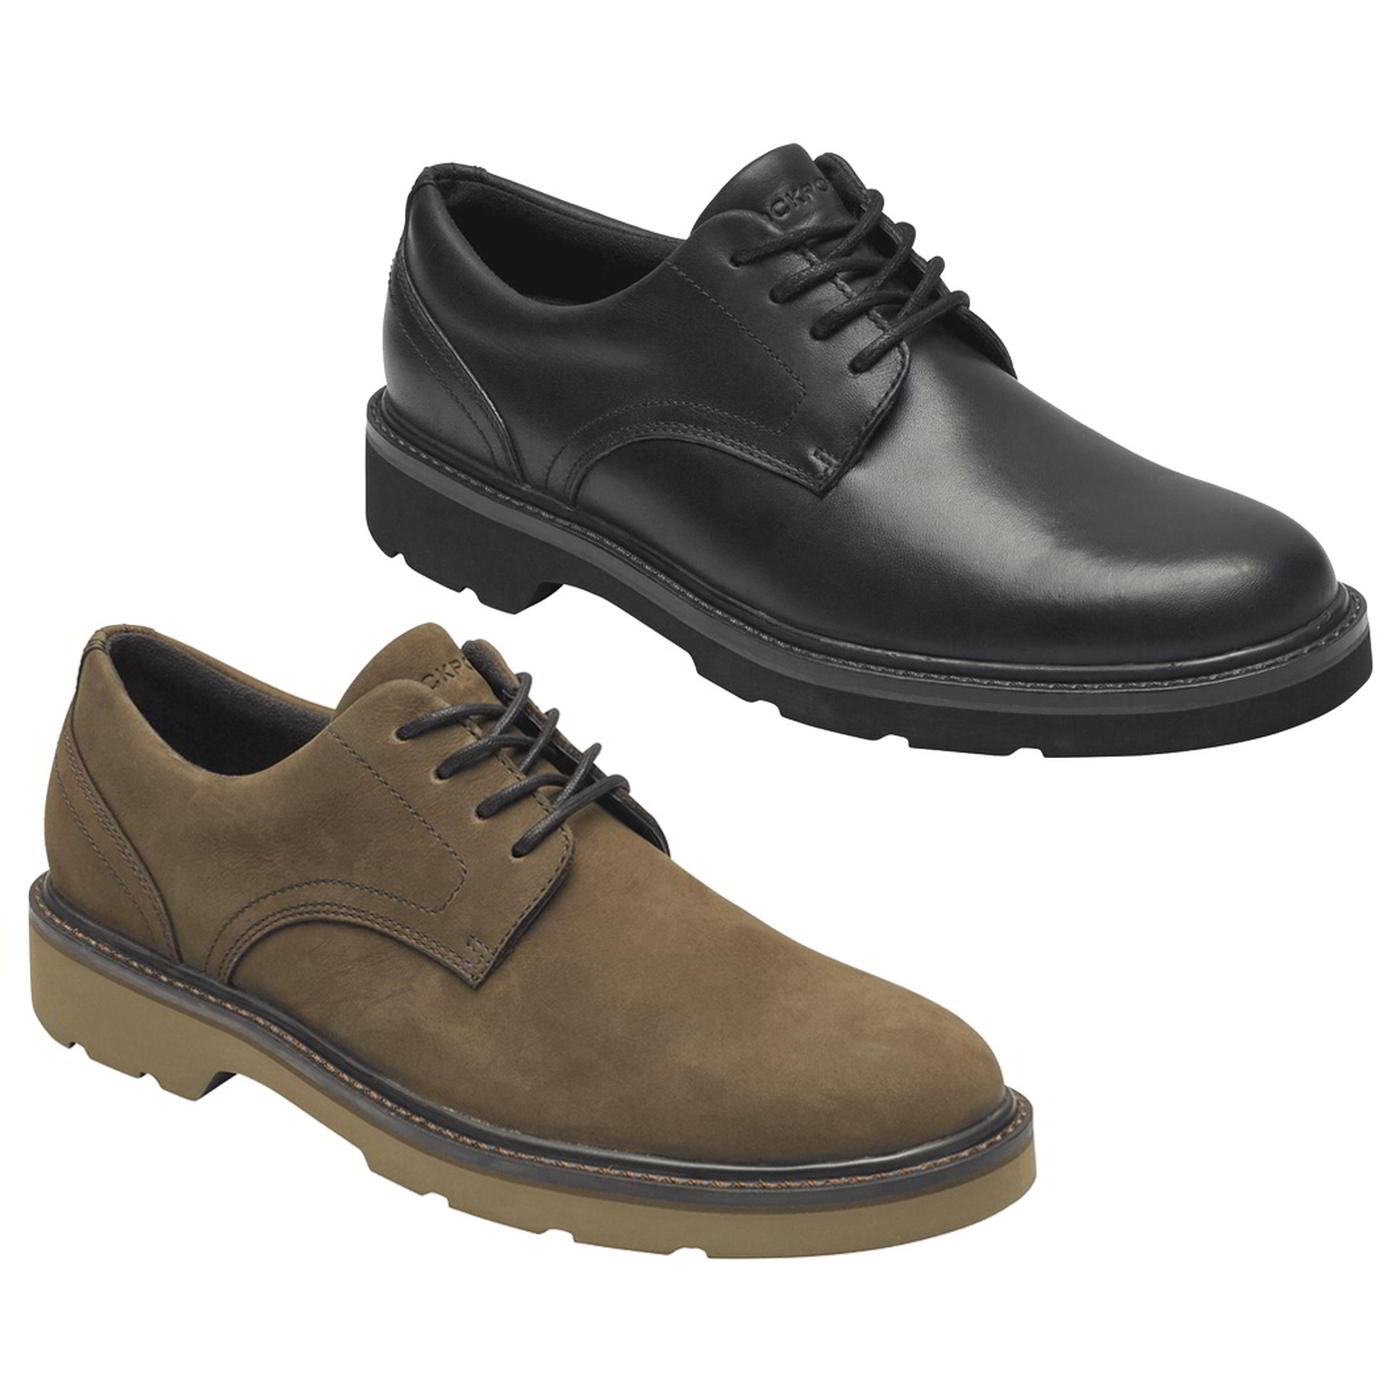 Rockport Charlee Mens Waterproof Black Brown Leather Walking Shoes Size 8-11